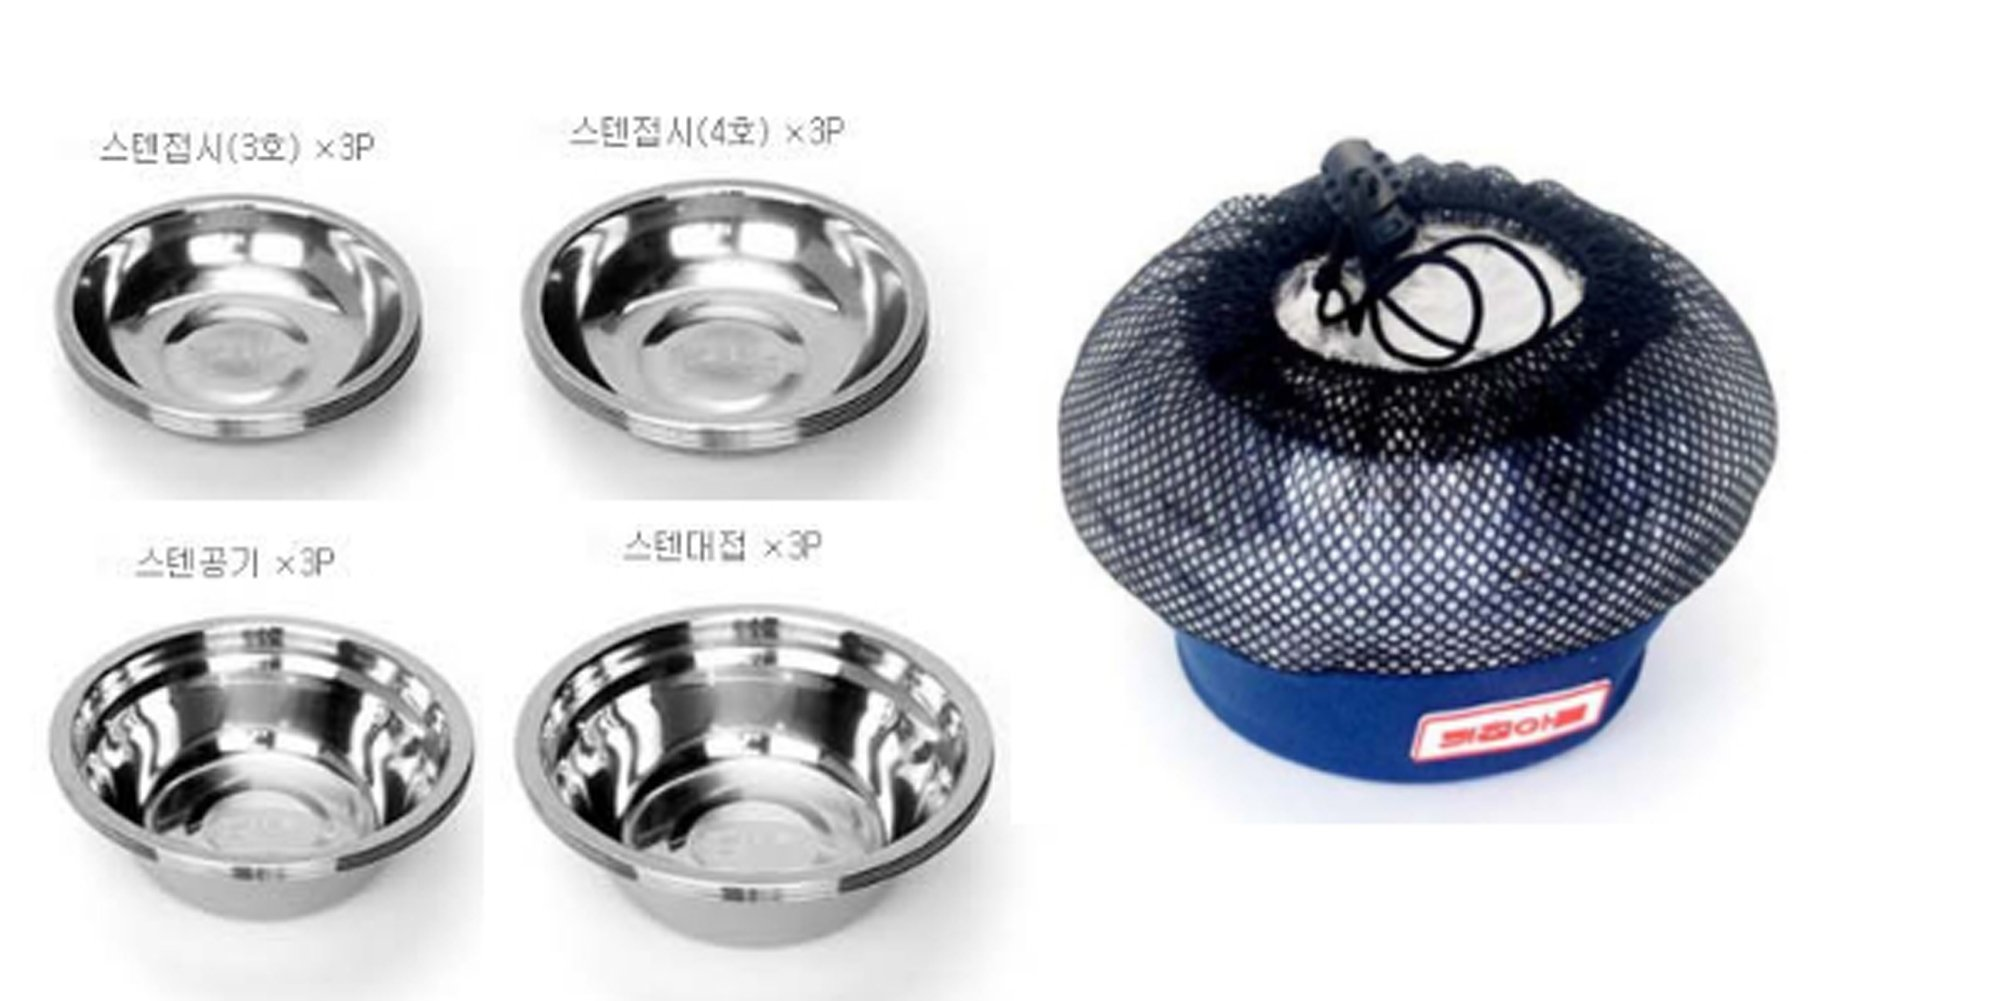 Kitchen Art Stainless Steel Camping Bowls Set 13pcs by Kitchen Art